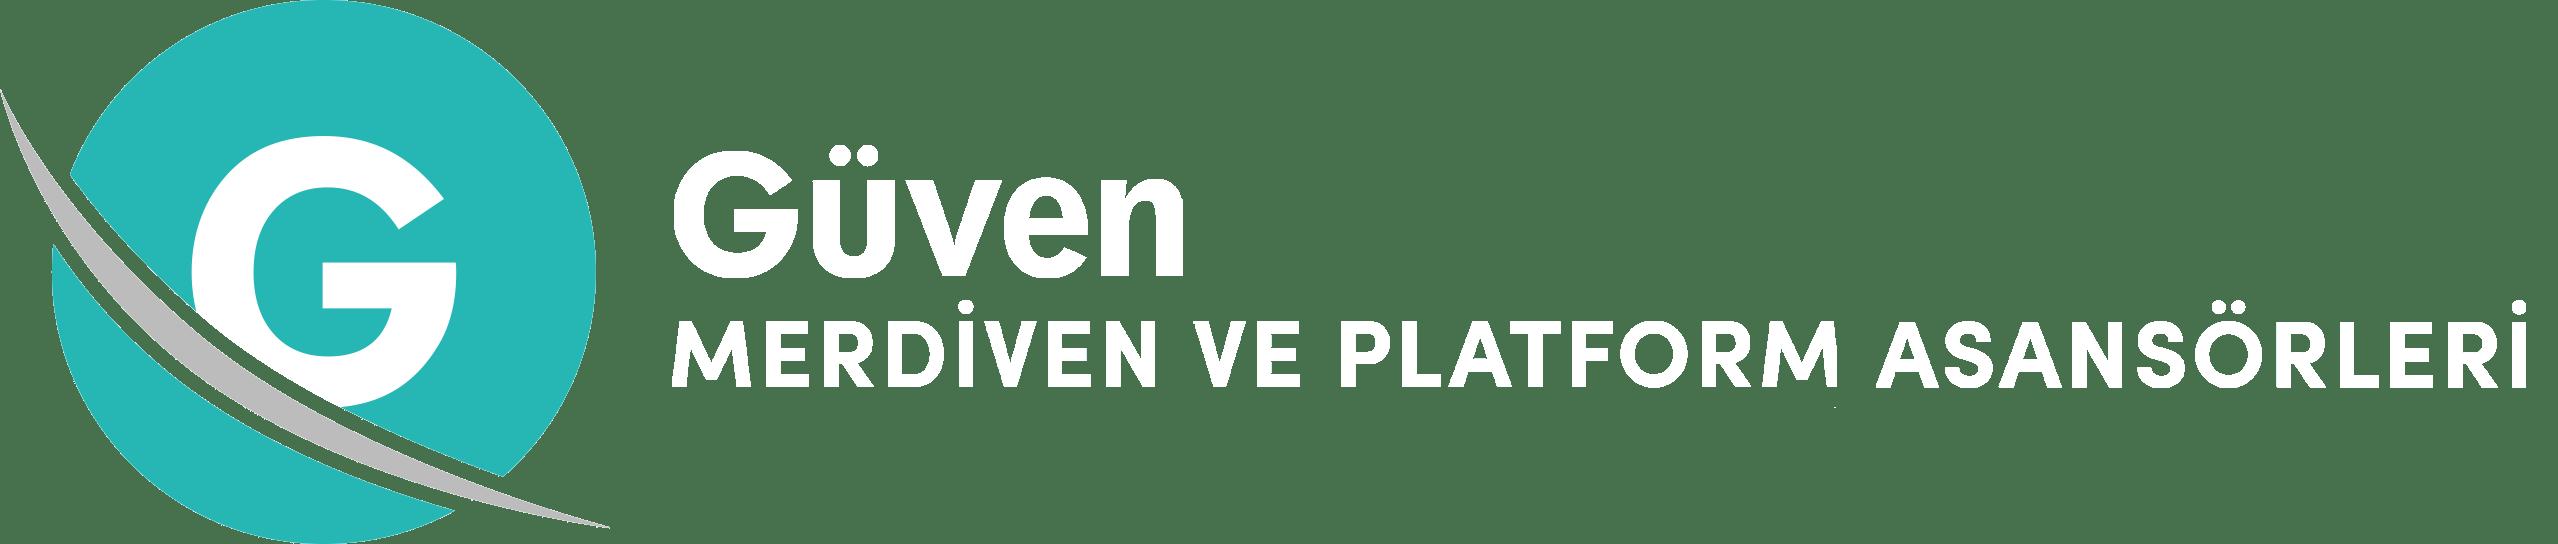 logo-light-2x.png